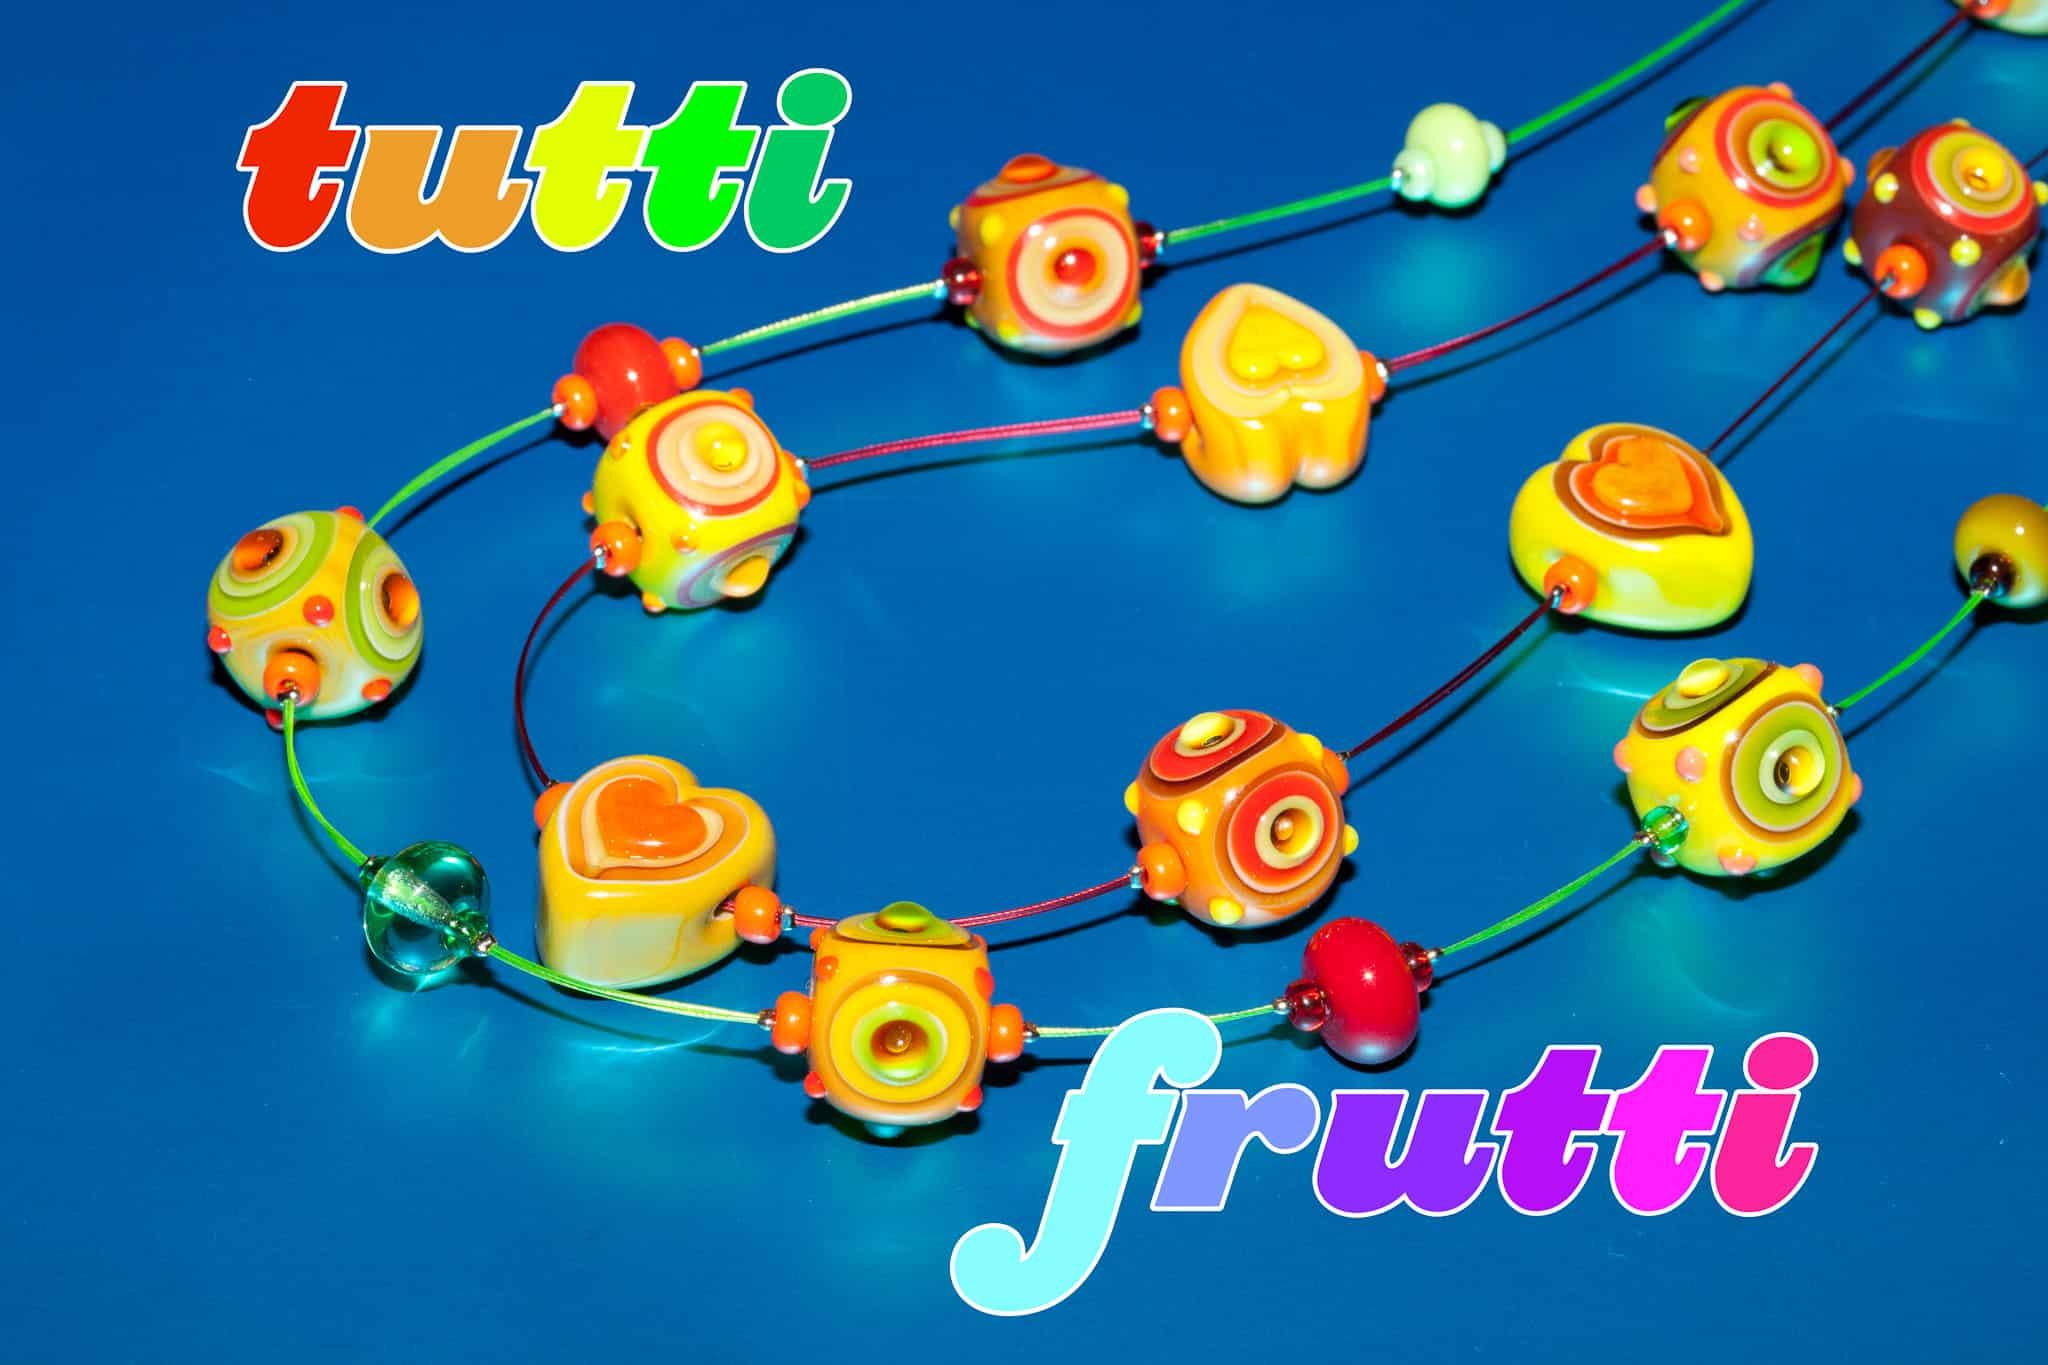 tutti_frutti-slider-01